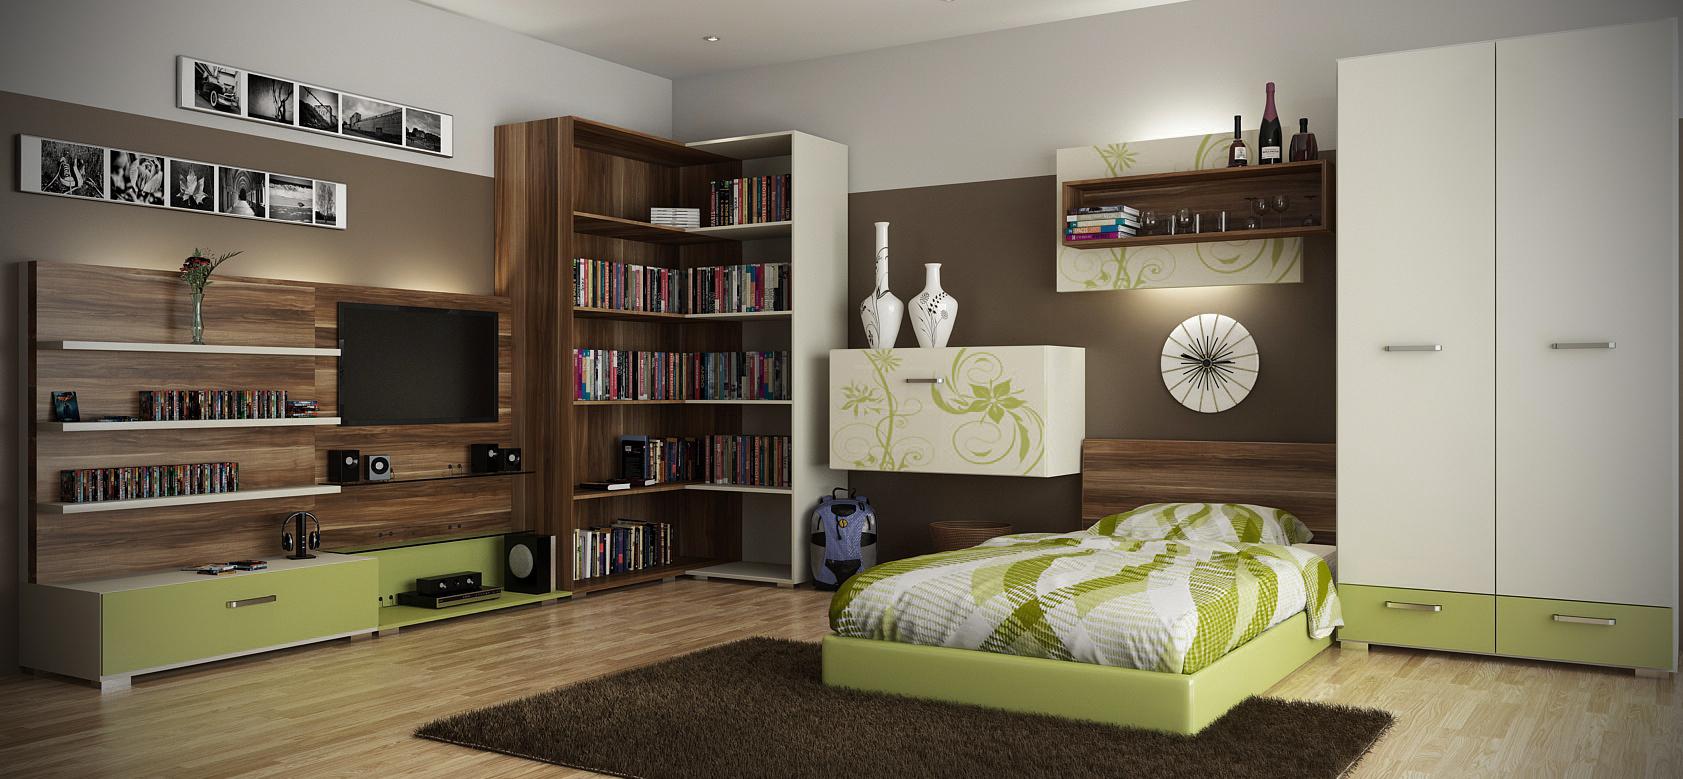 اجمل صور غرف نوم room_17_by_m_pixel-d